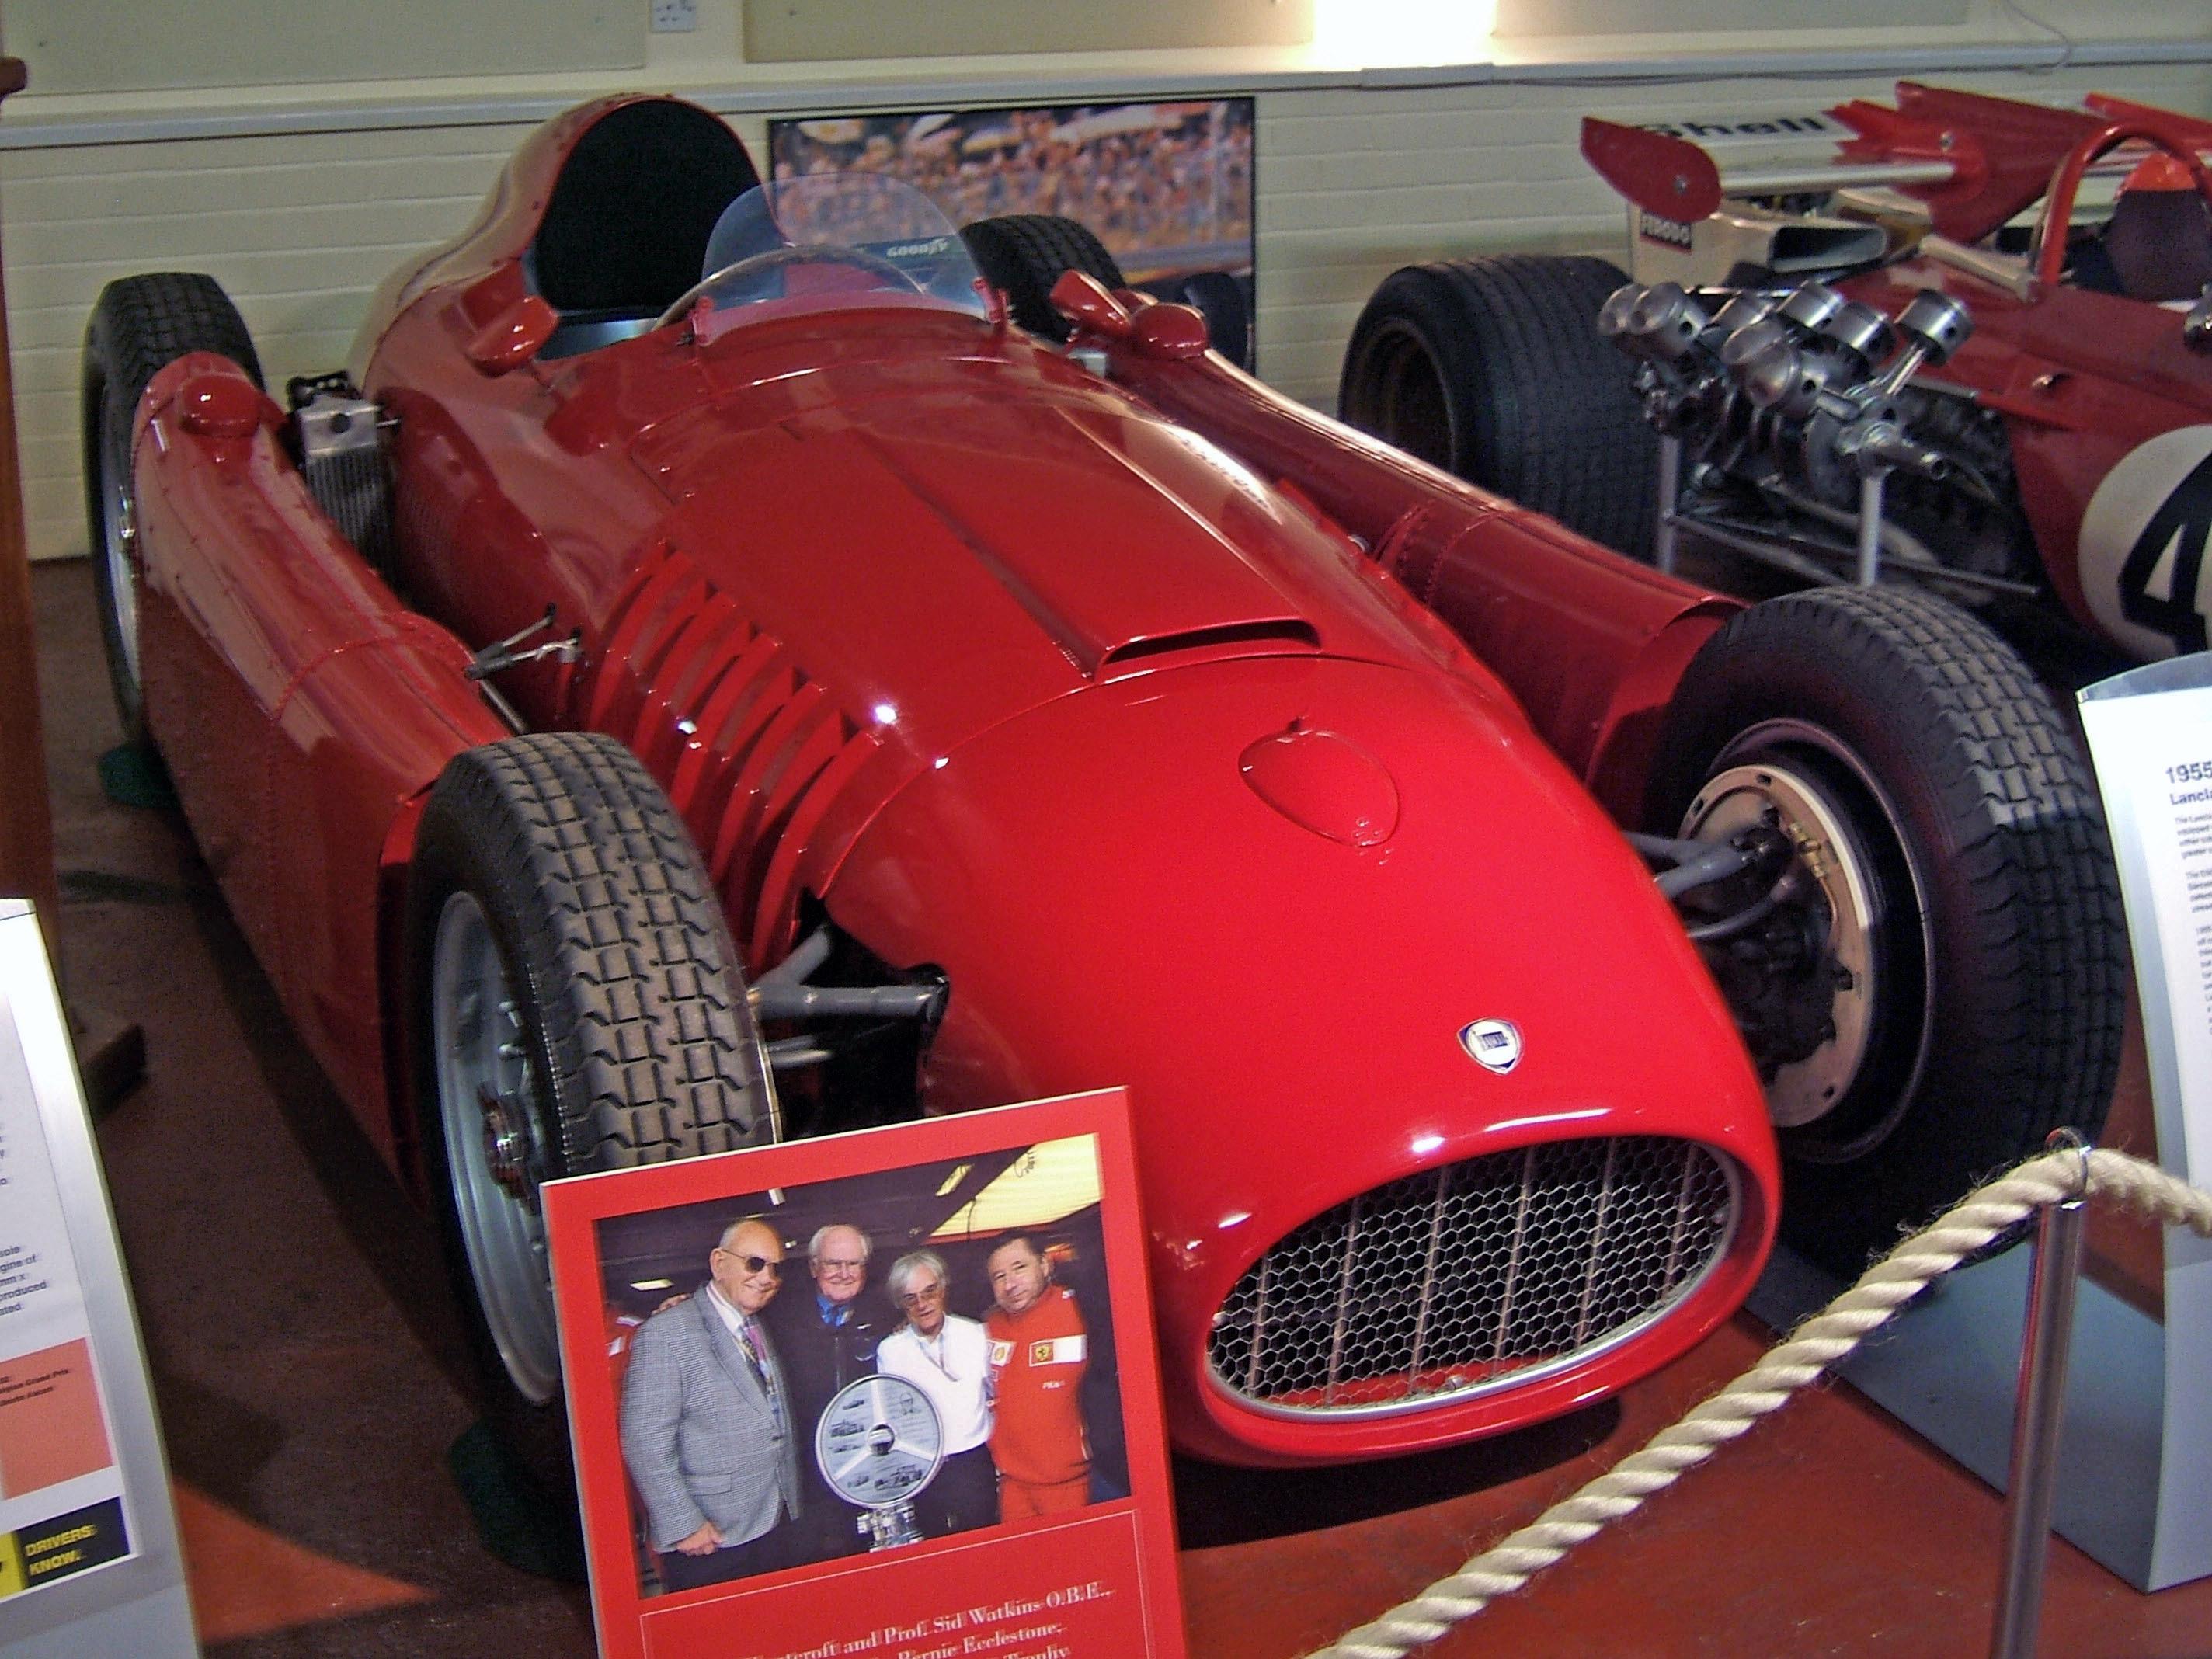 http://dic.academic.ru/pictures/wiki/files/76/Lancia_D50_Donington.jpg